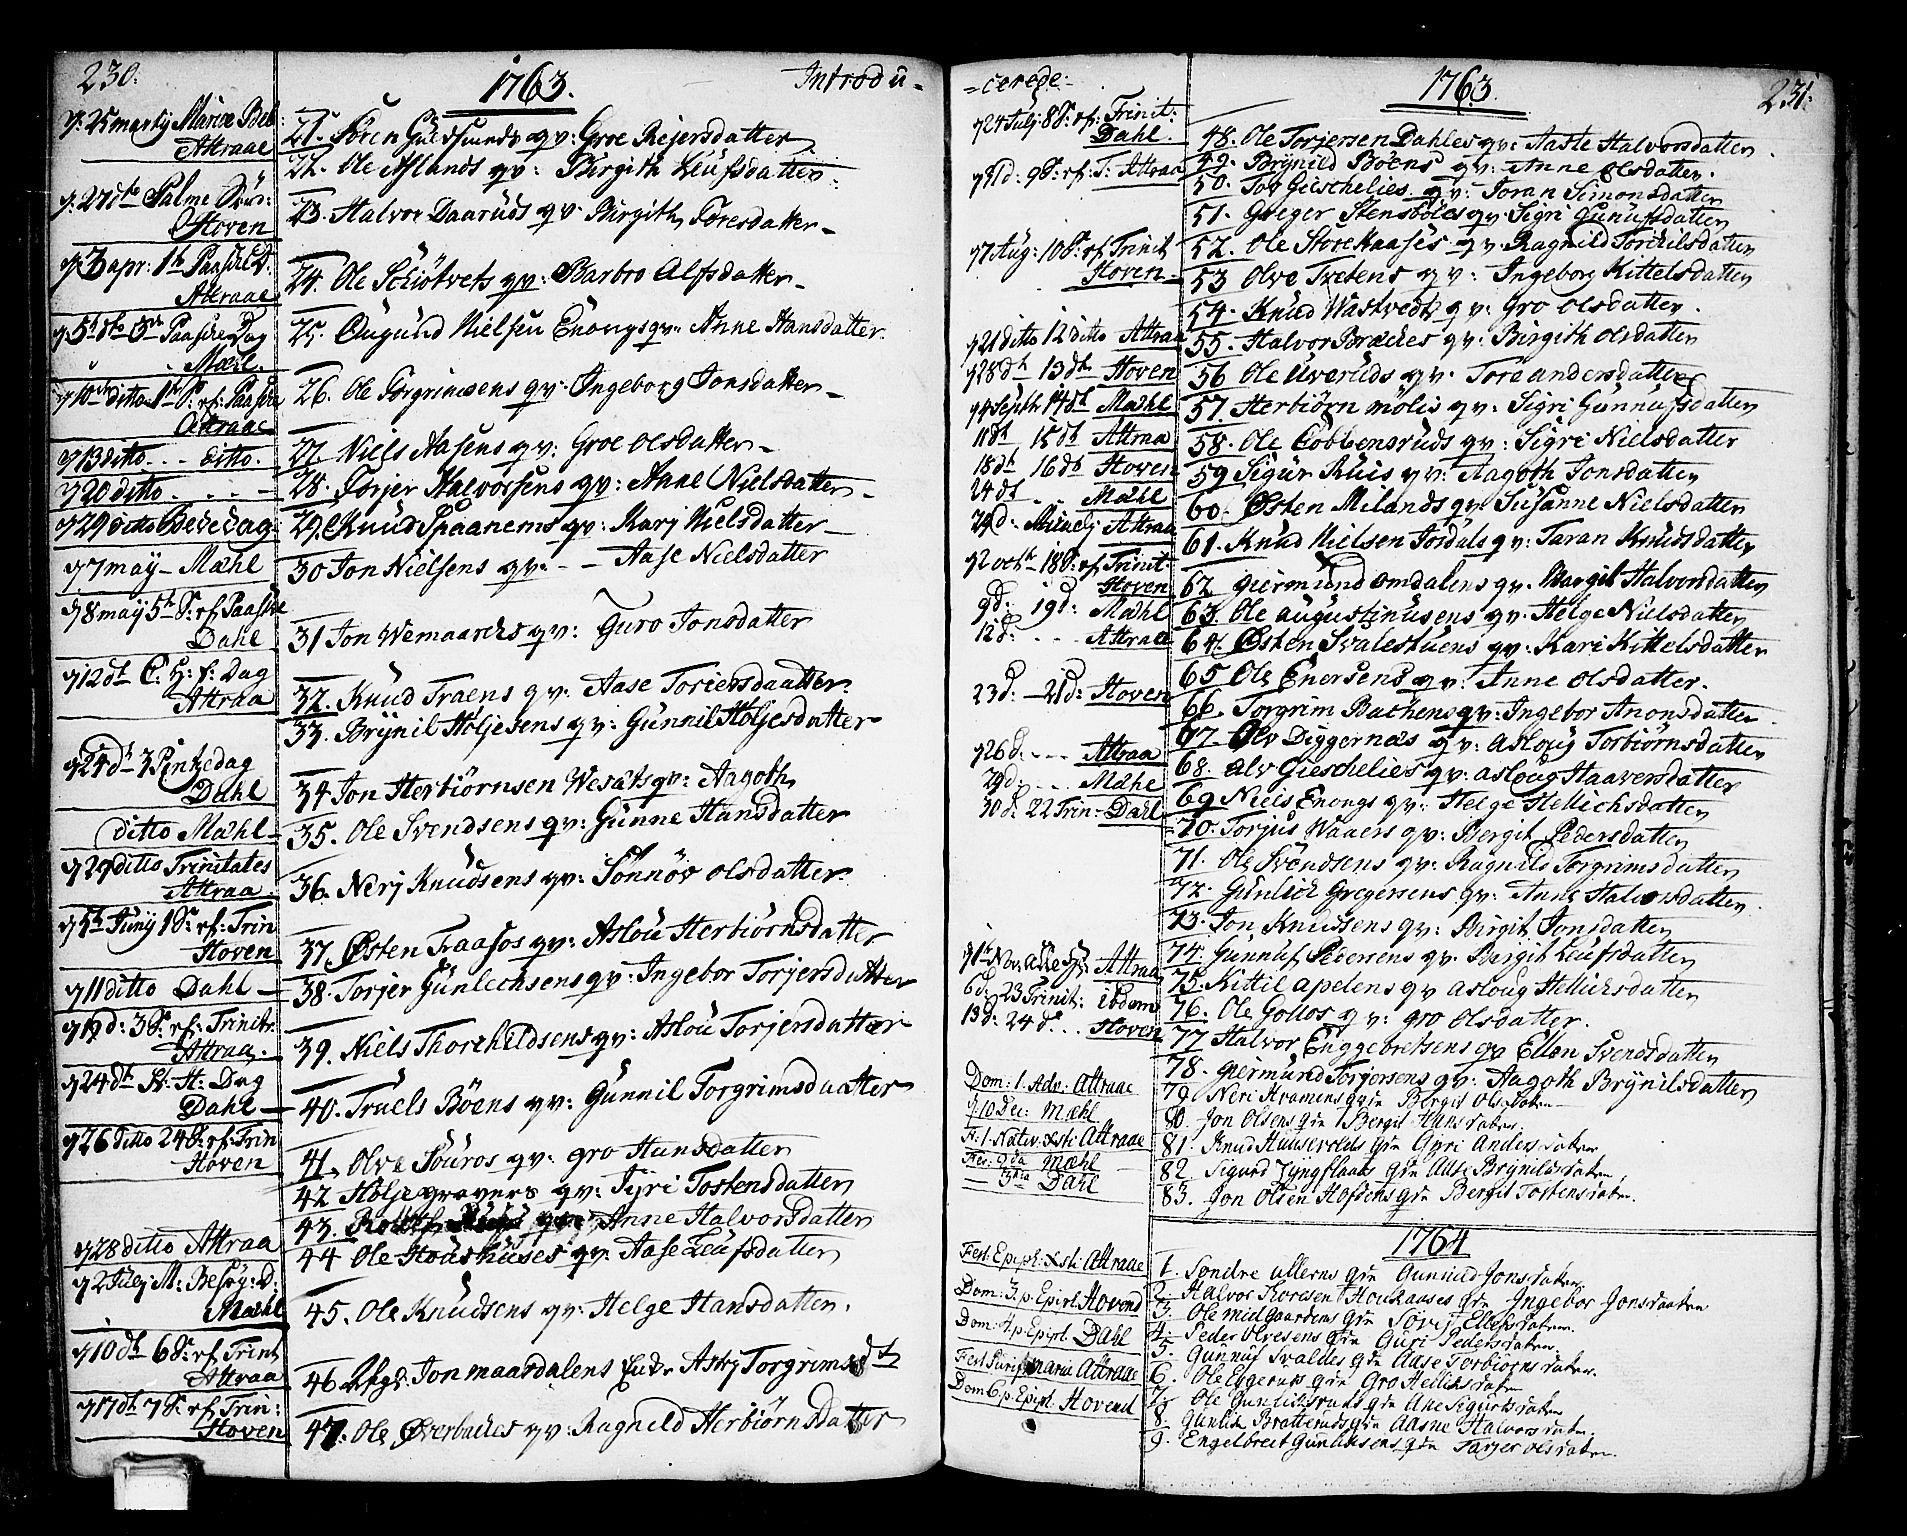 SAKO, Tinn kirkebøker, F/Fa/L0002: Ministerialbok nr. I 2, 1757-1810, s. 230-231